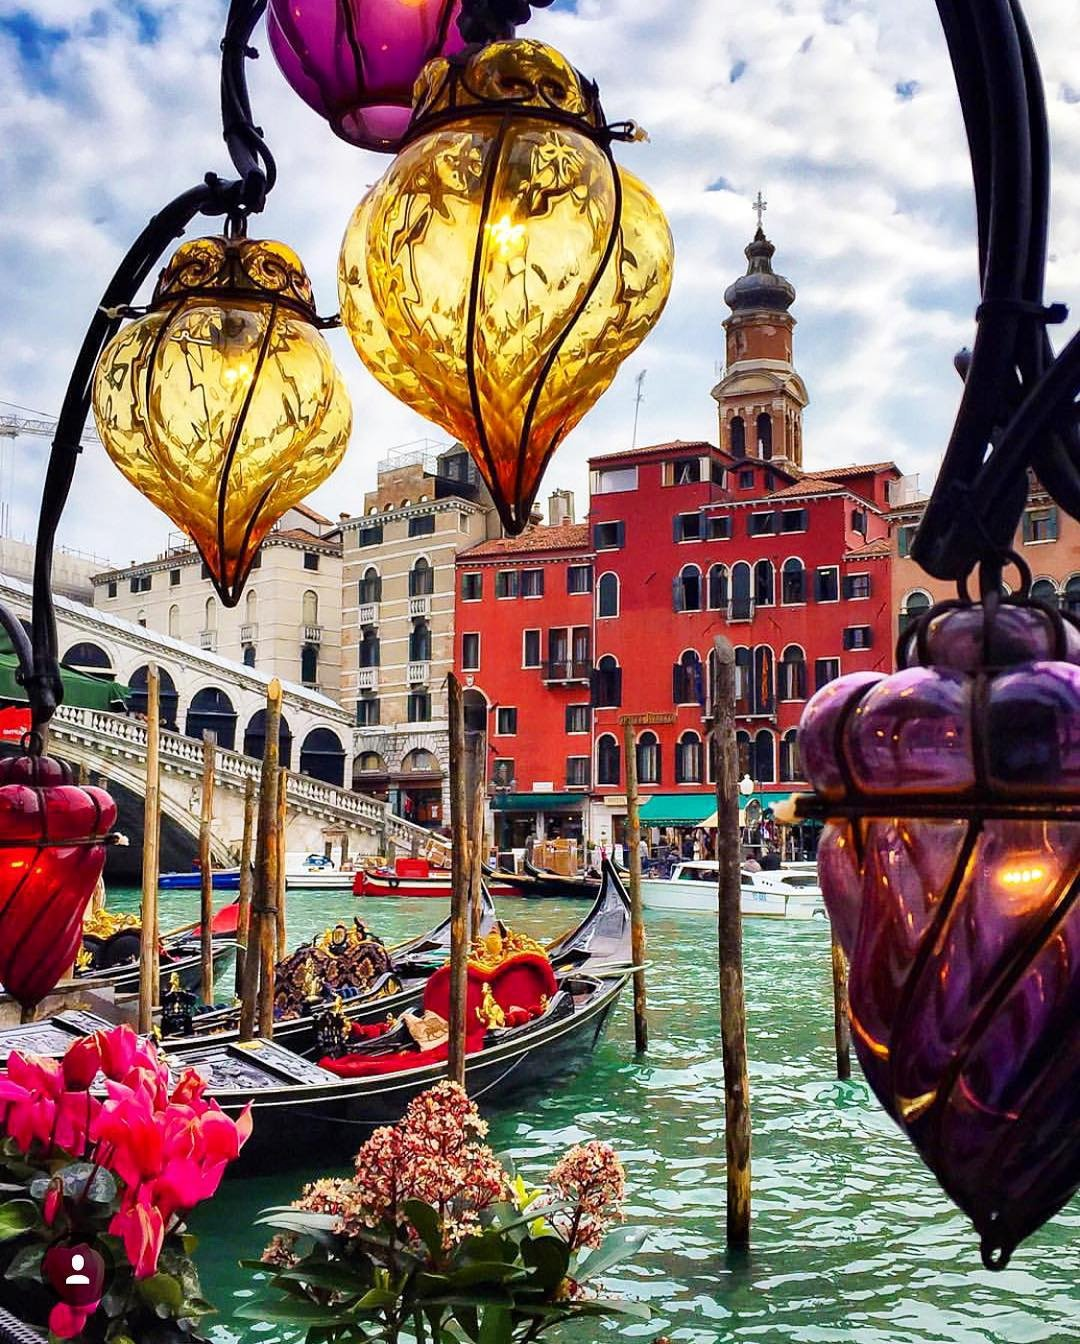 John Joseph's ITALY Travel Guide: Rome, Florence, Venice & More - cover